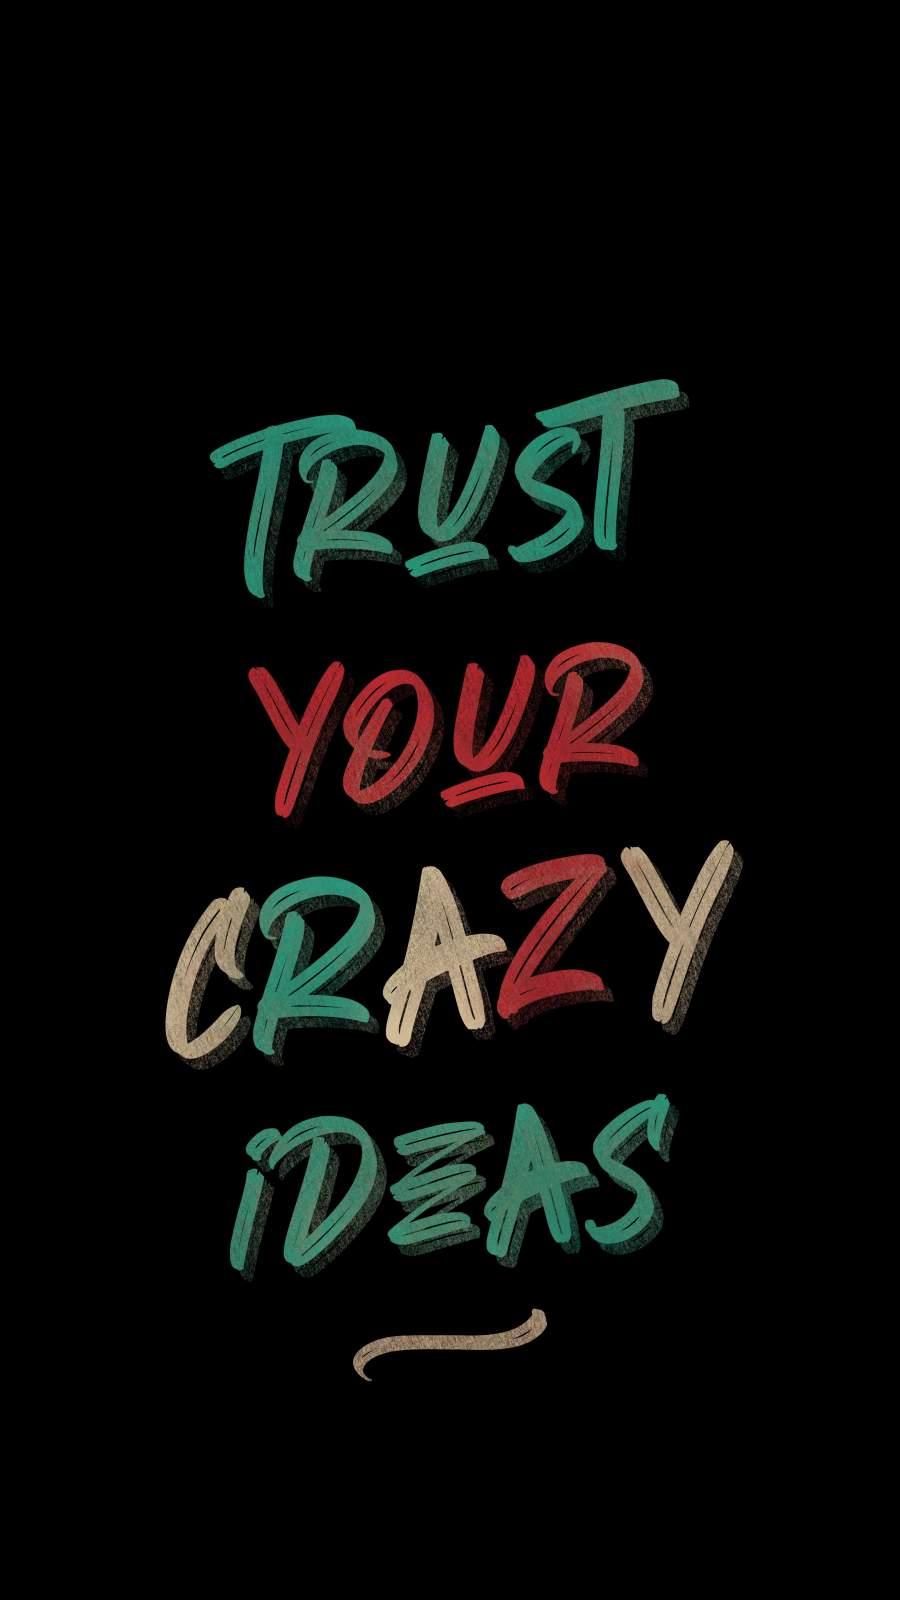 Trust Your Crazy Ideas iPhone Wallpaper